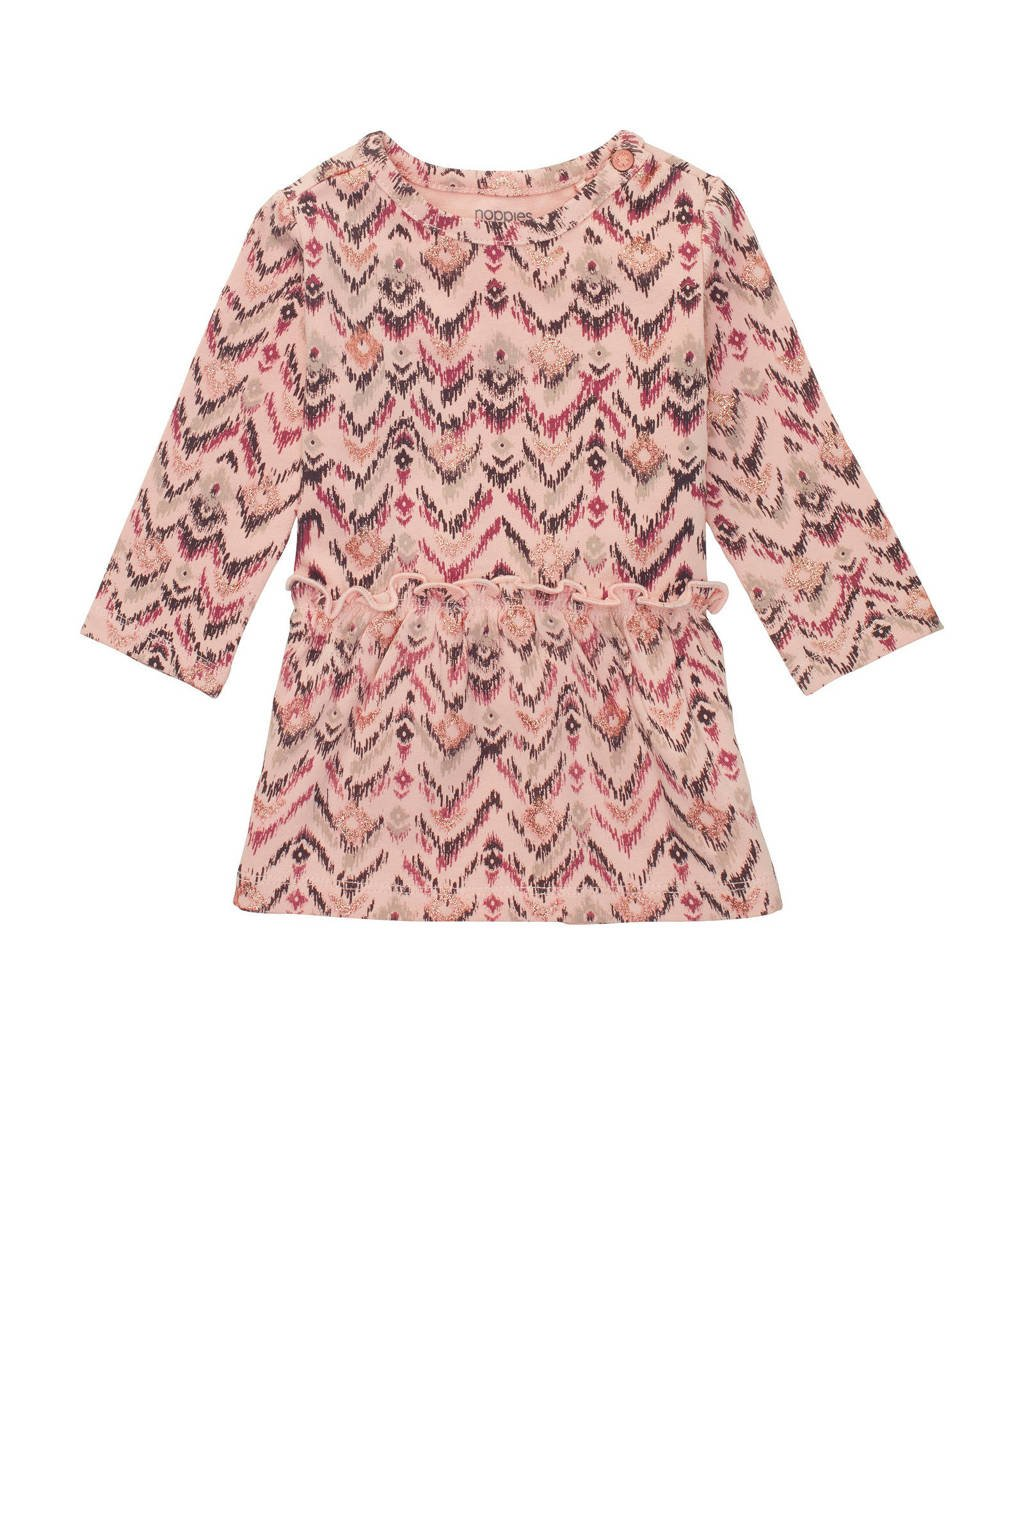 Noppies baby jurk Savannah met all over print en ruches lichtroze, Lichtroze